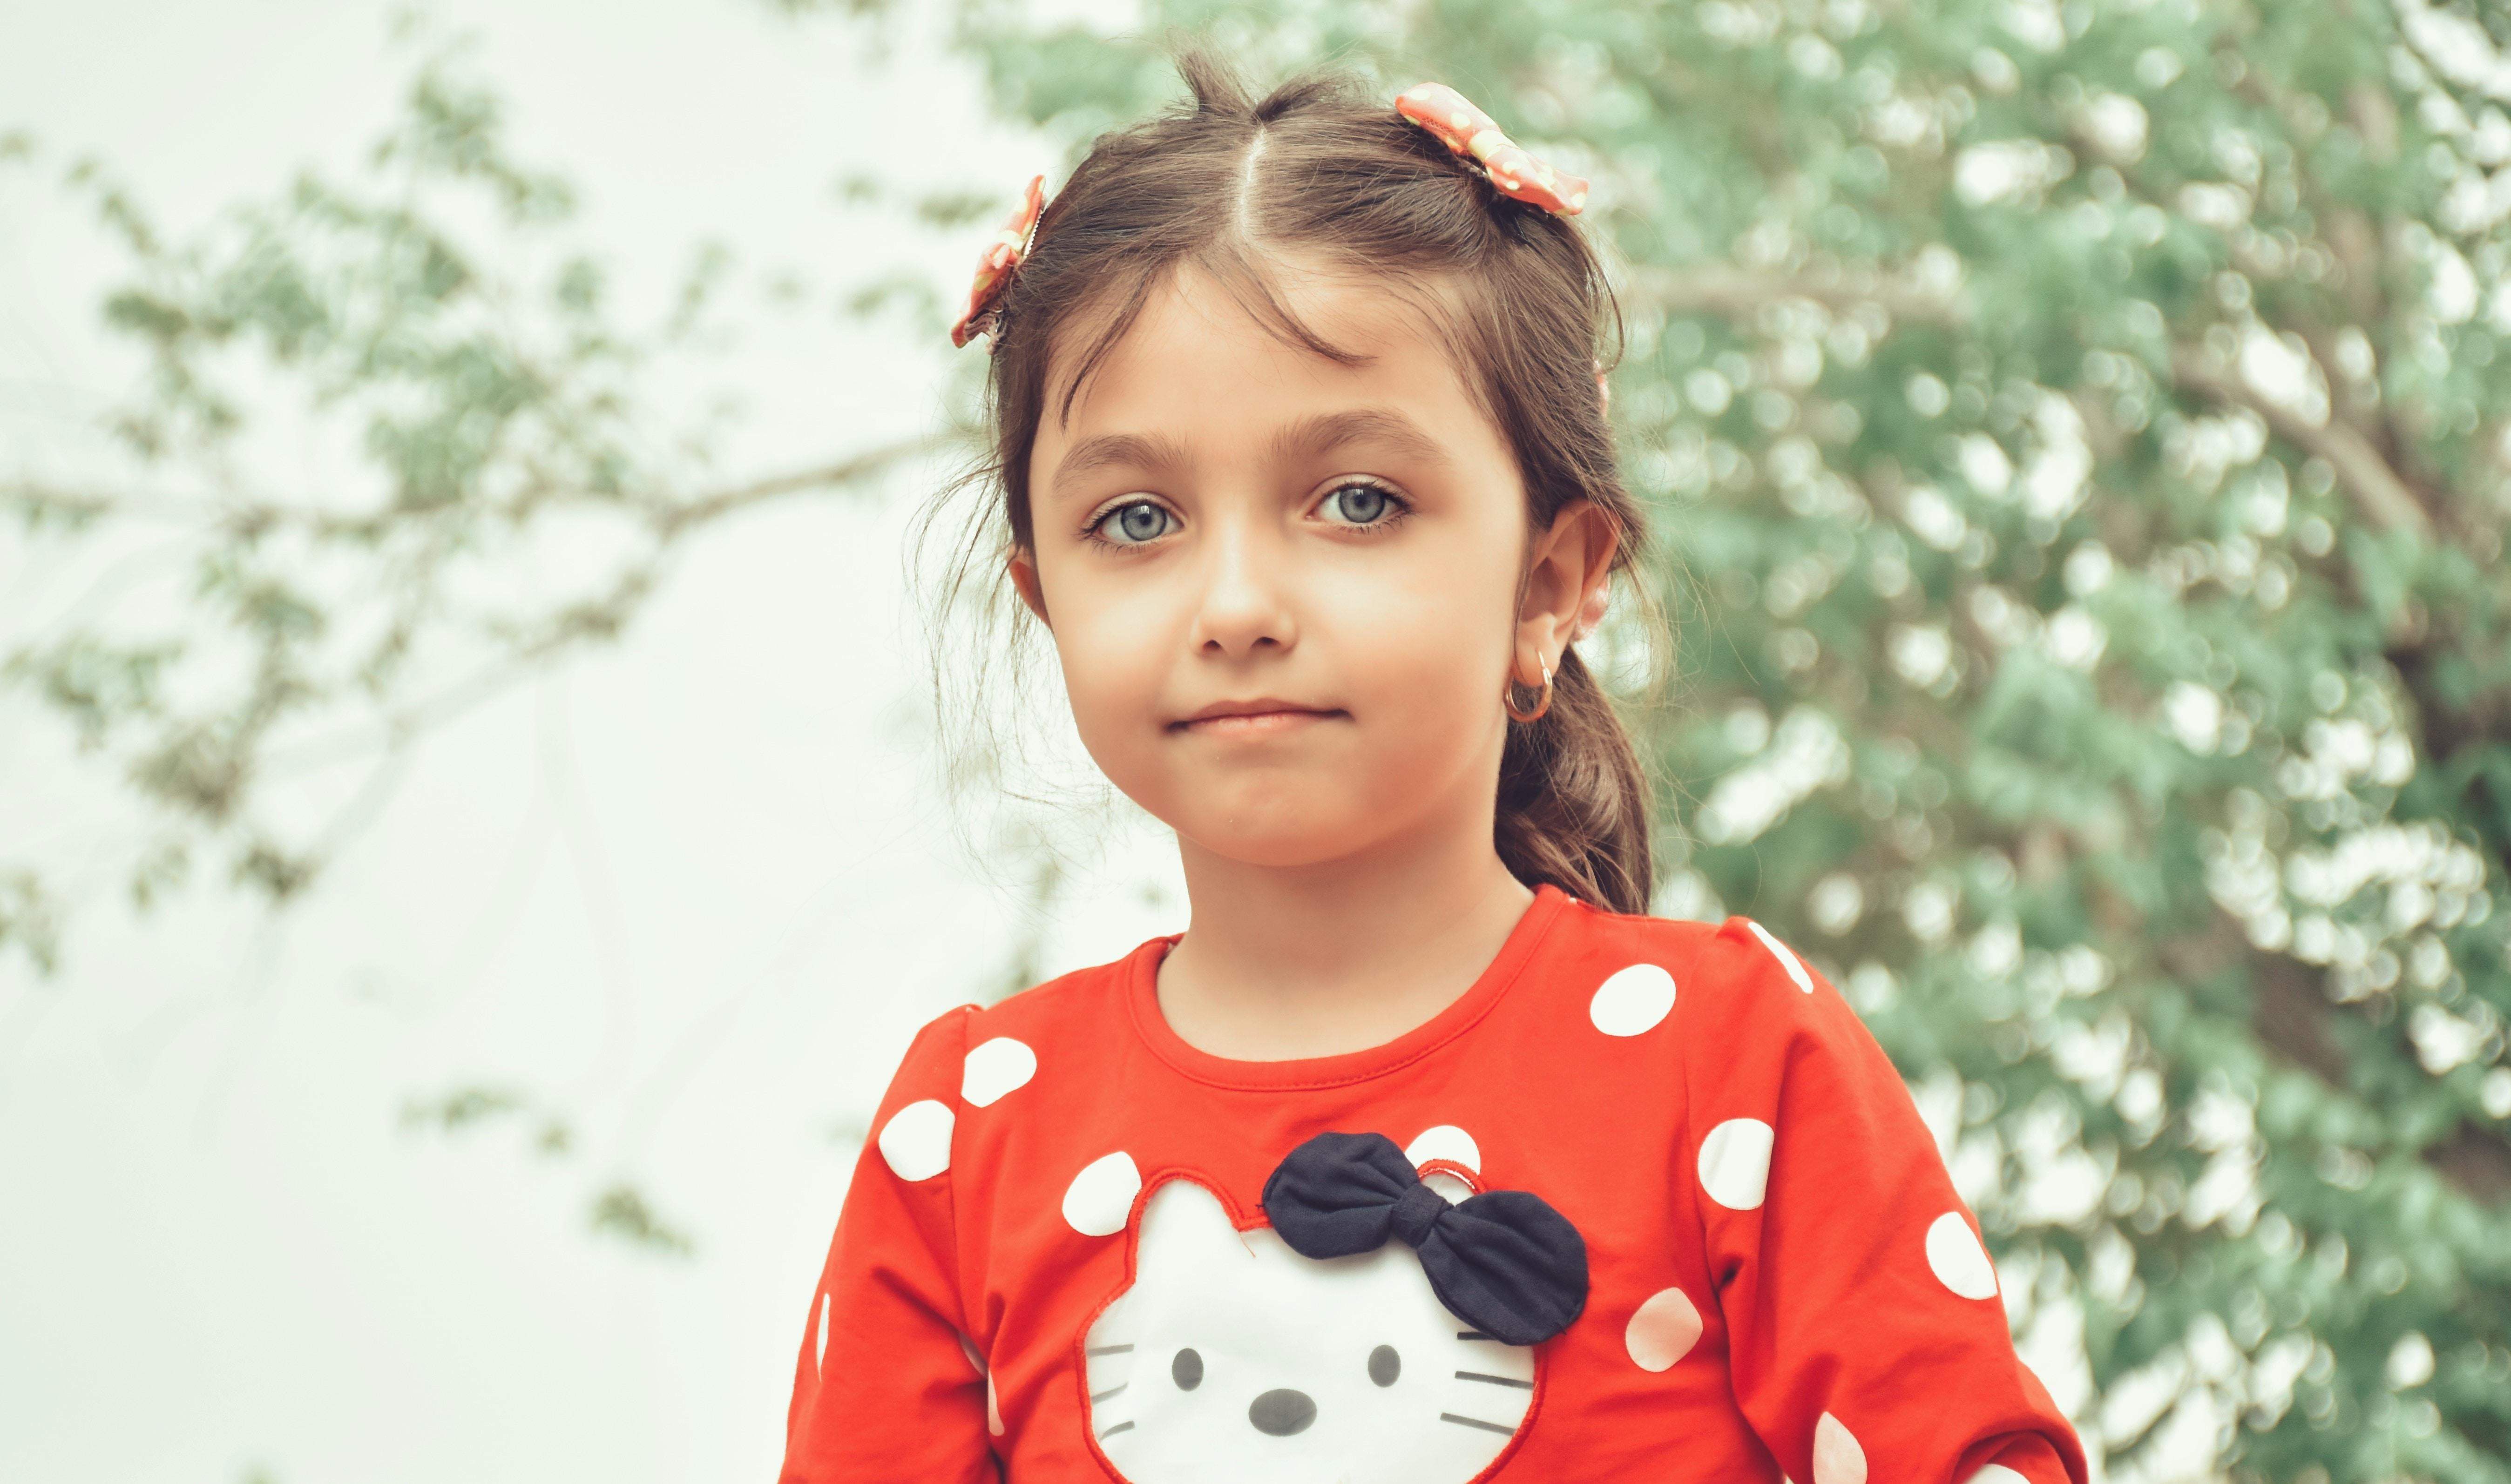 Image by Zahra Amiri